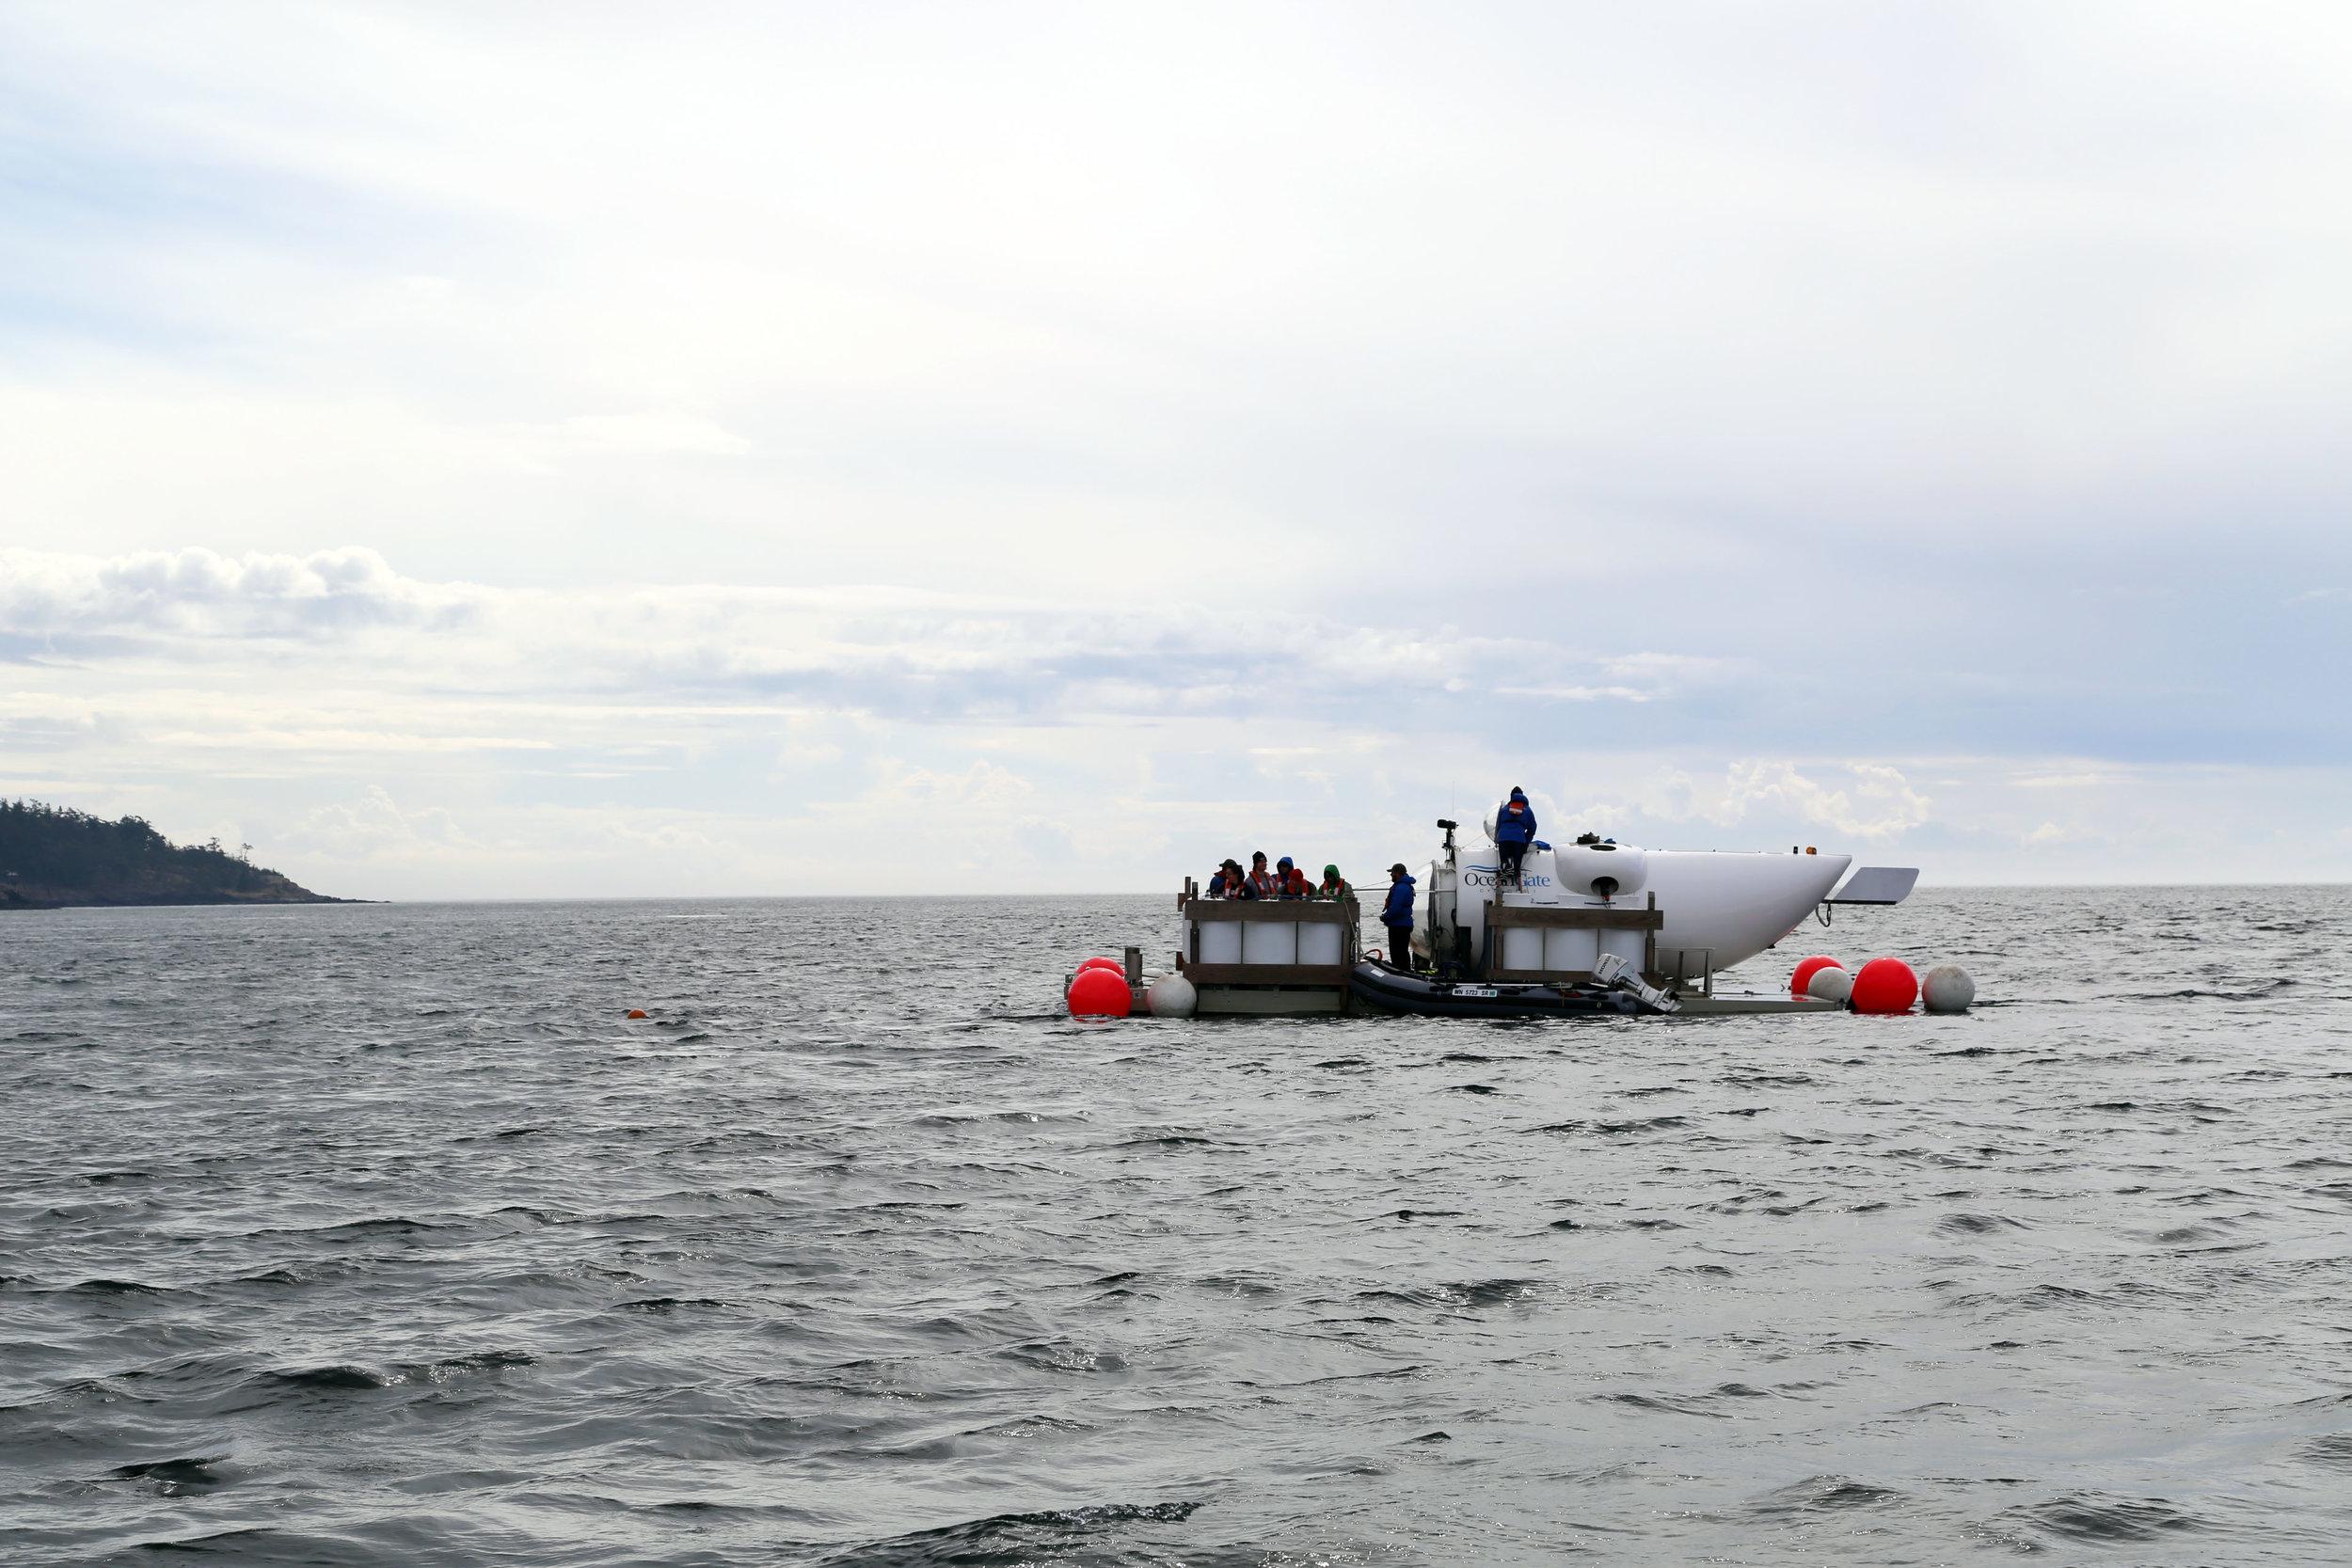 OceanGate-Dive-Team-on-Platform.JPG